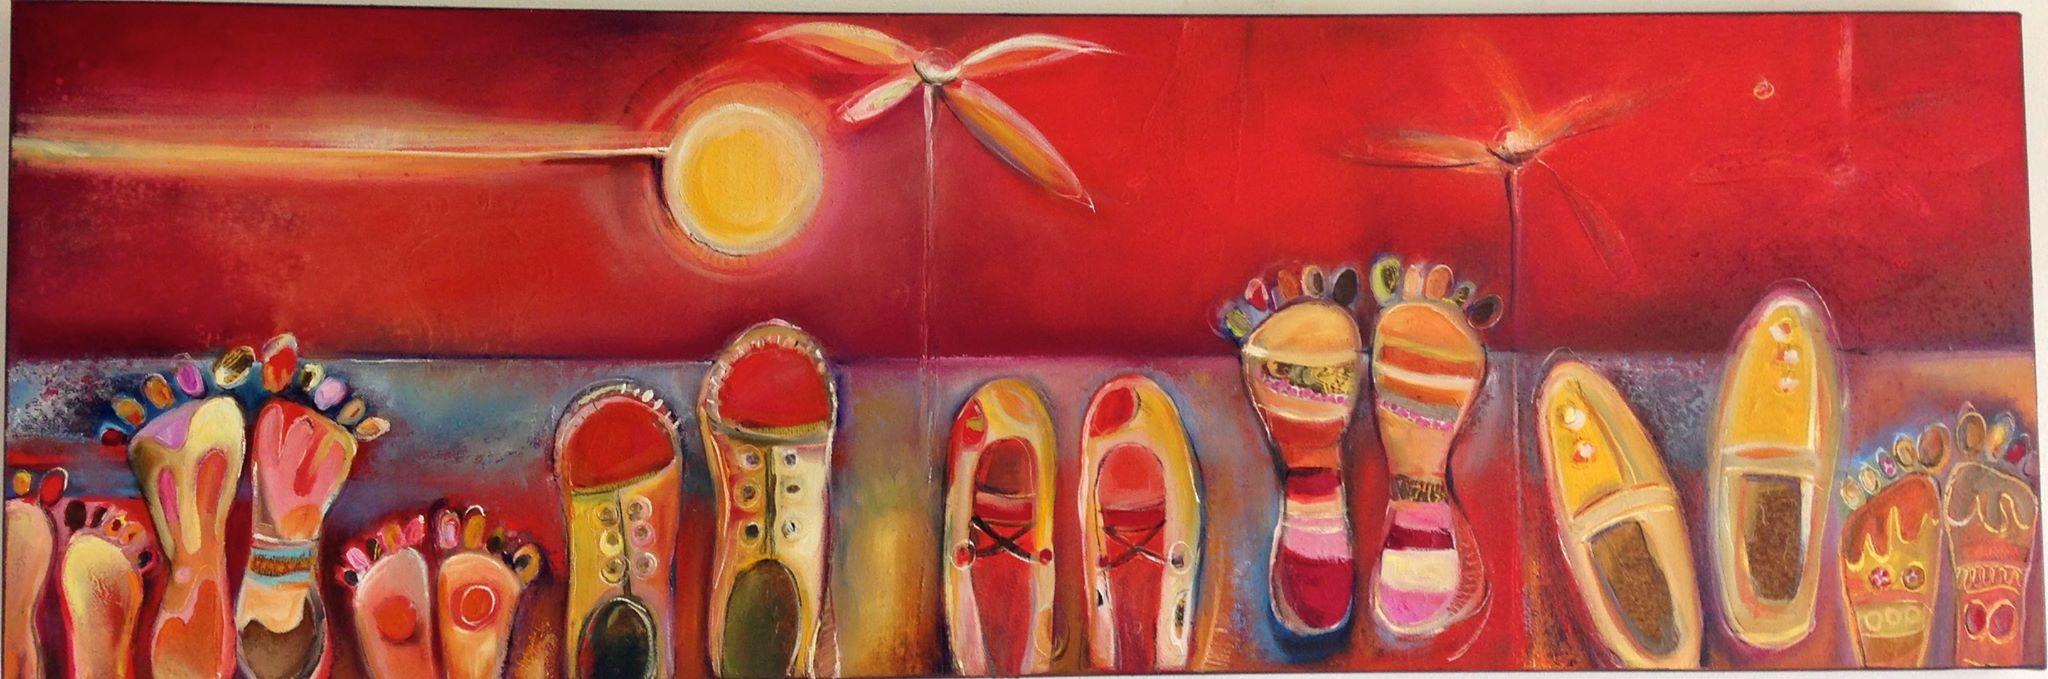 Peinture D'Aurore Dahin